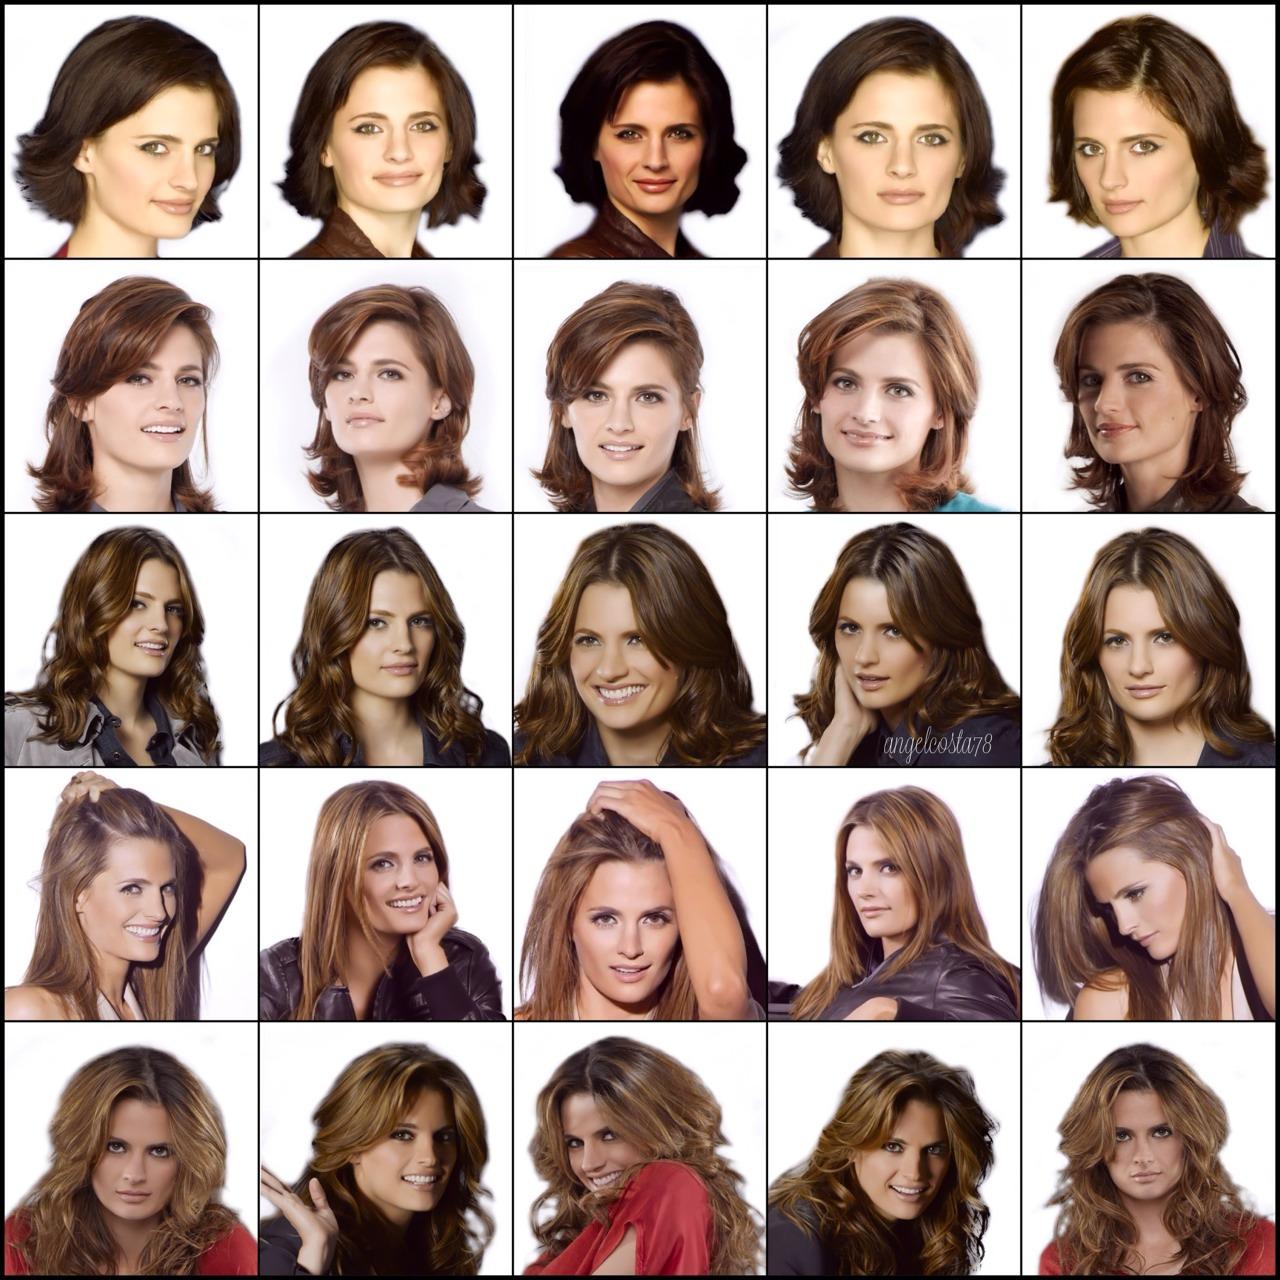 In Focus The Various Looks Of Kate Beckett Arabella & Jaune